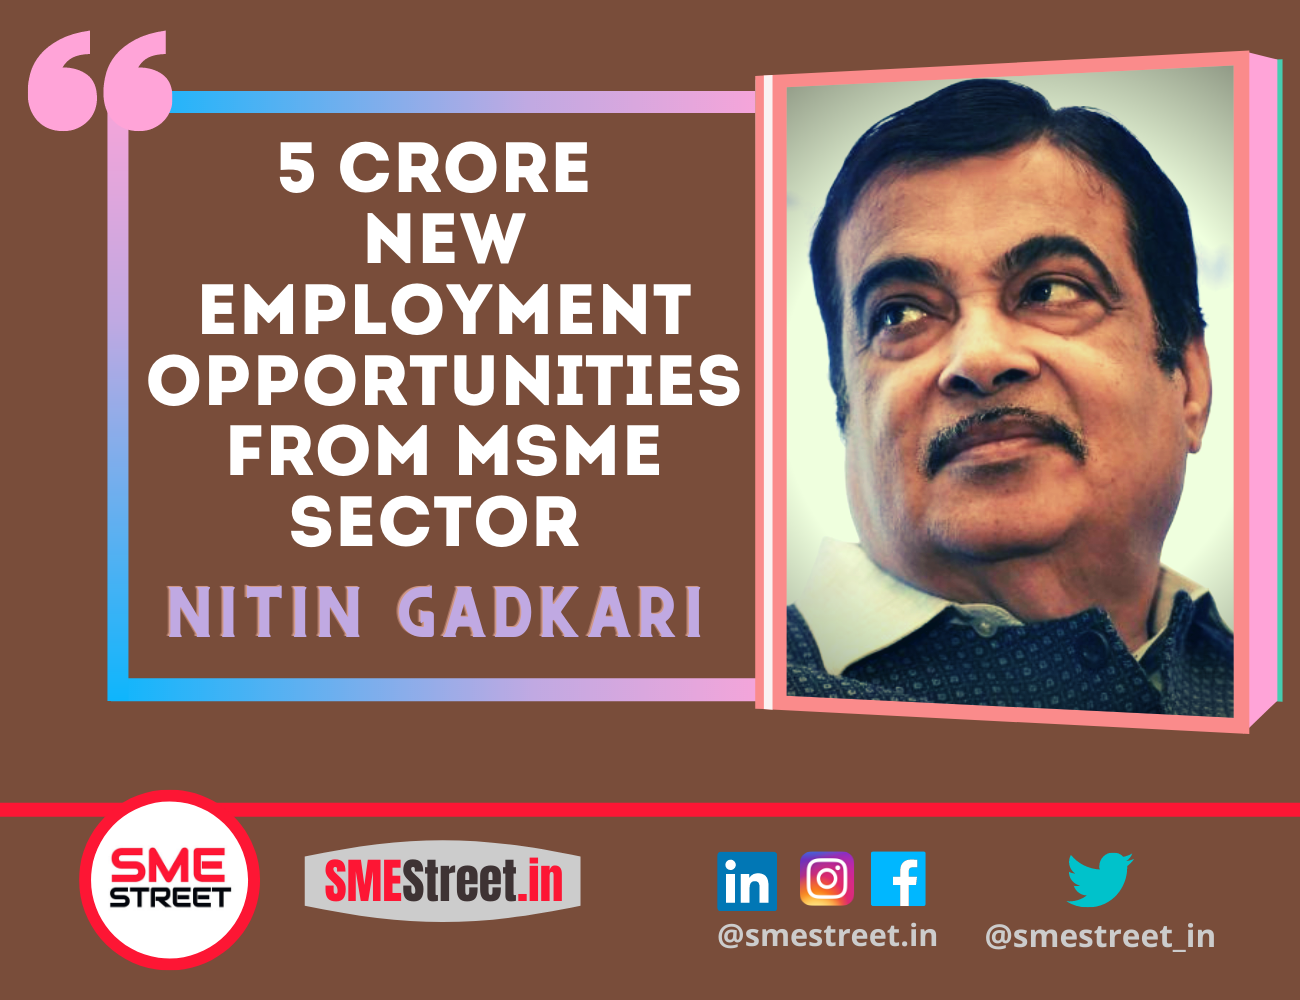 Nitin Gadkari, MSME, Job Creation, SMEStreet